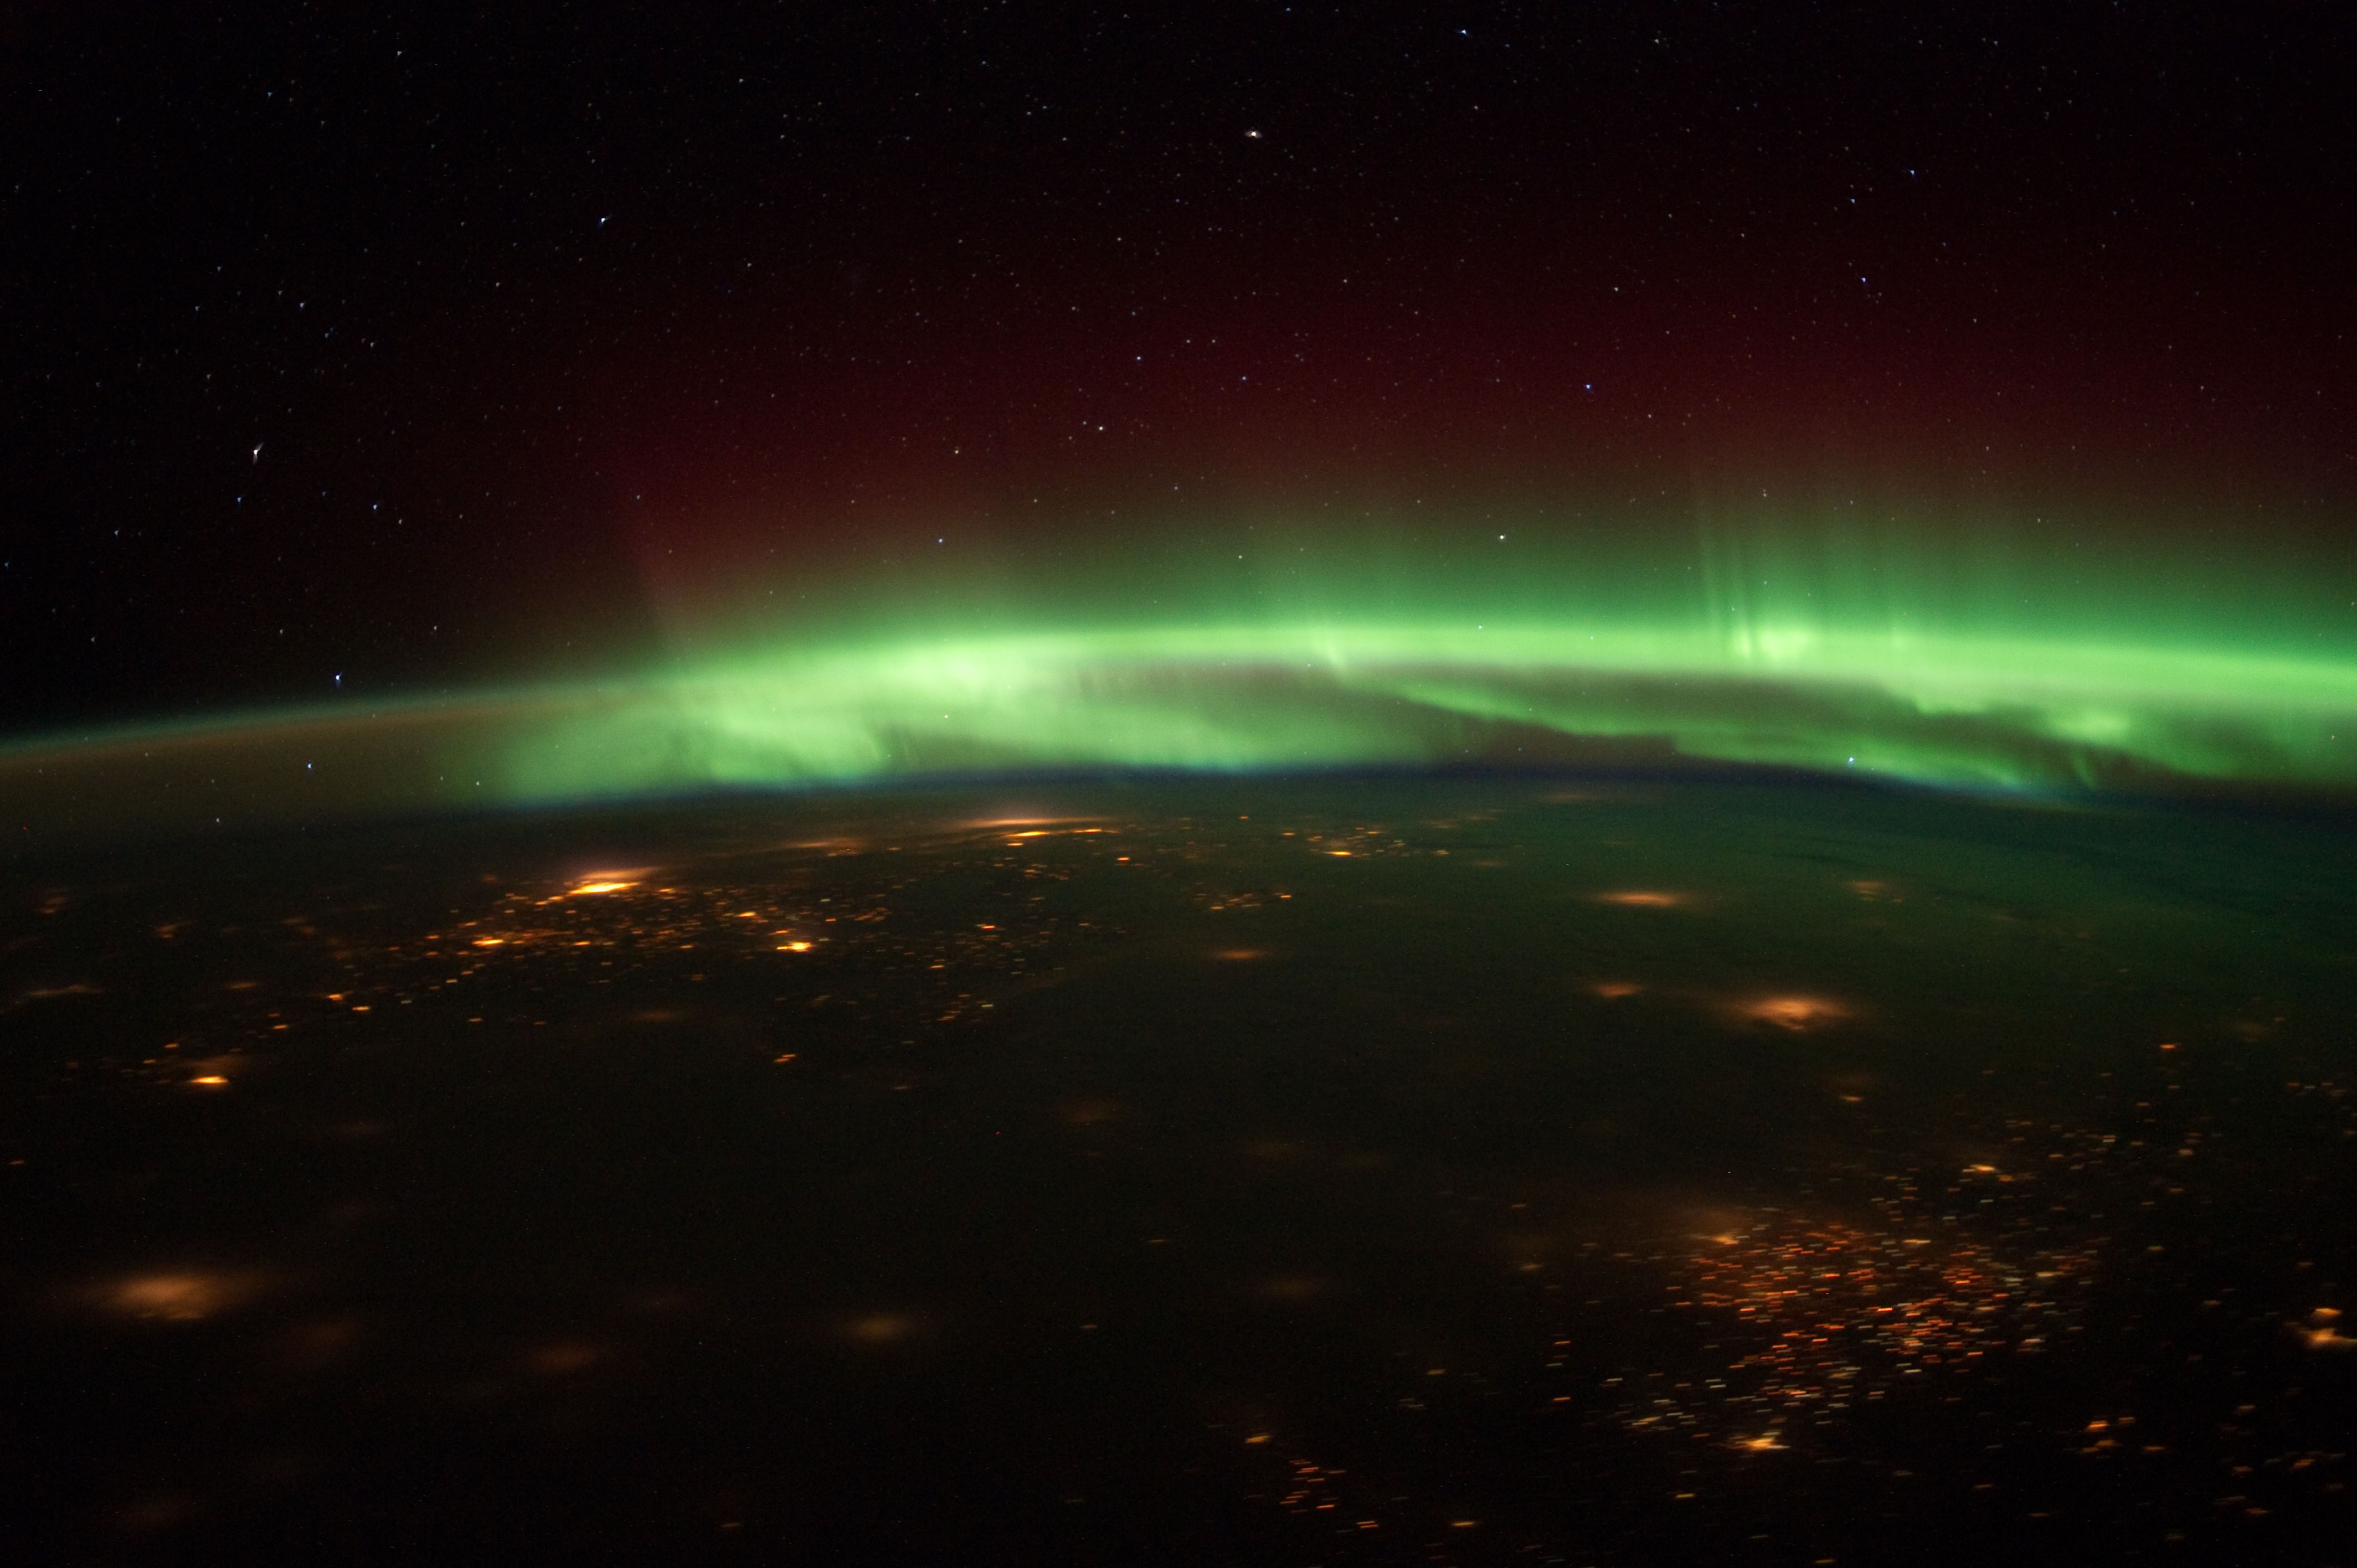 us nasa space station - photo #34